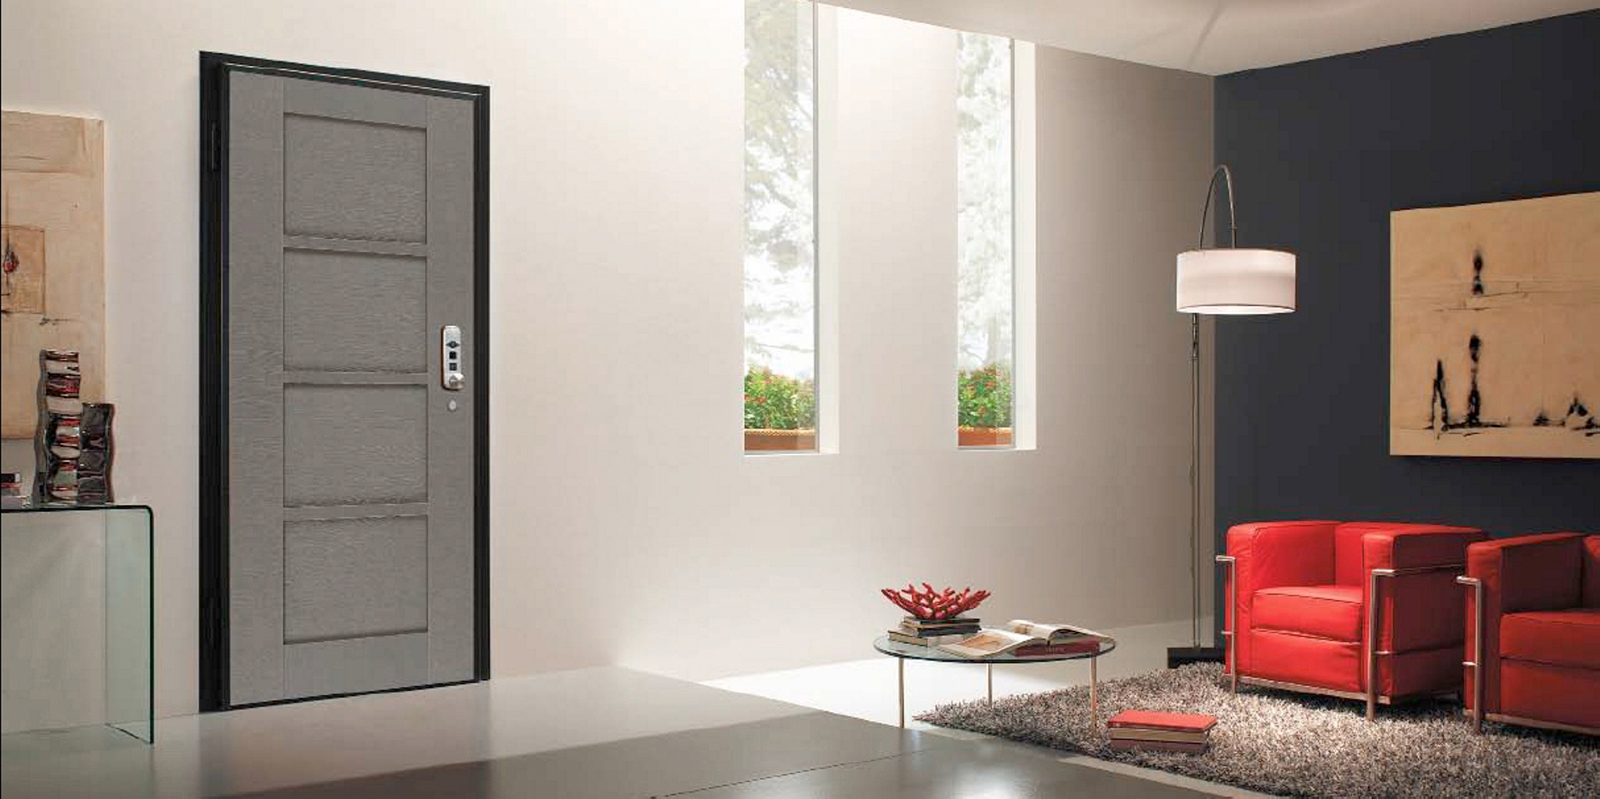 Porte blindate infissi porte e serramenti tecnoalluminio - Carta da parati per porte leroy merlin ...